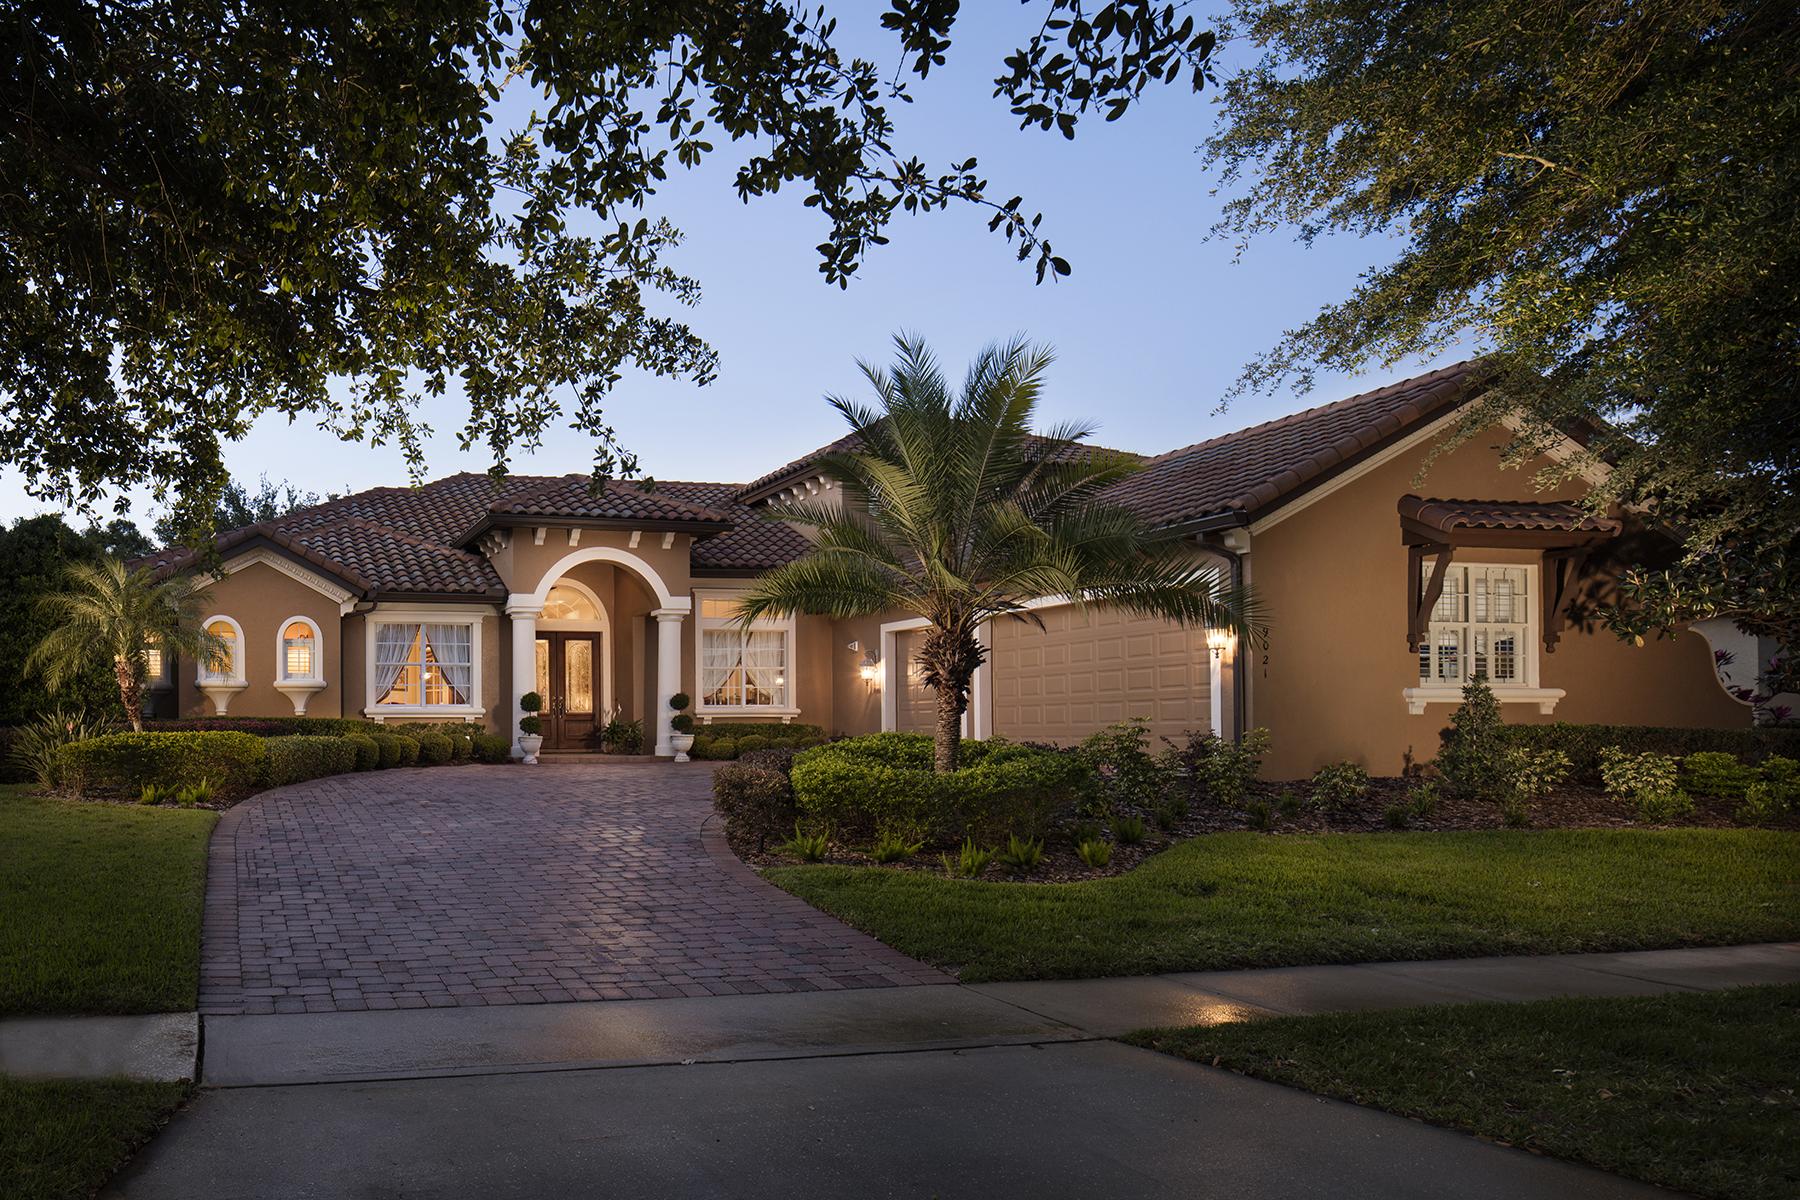 Moradia para Venda às 9021 Tavolini Terr , Windermere, FL 34786 9021 Tavolini Terr Windermere, Florida, 34786 Estados Unidos